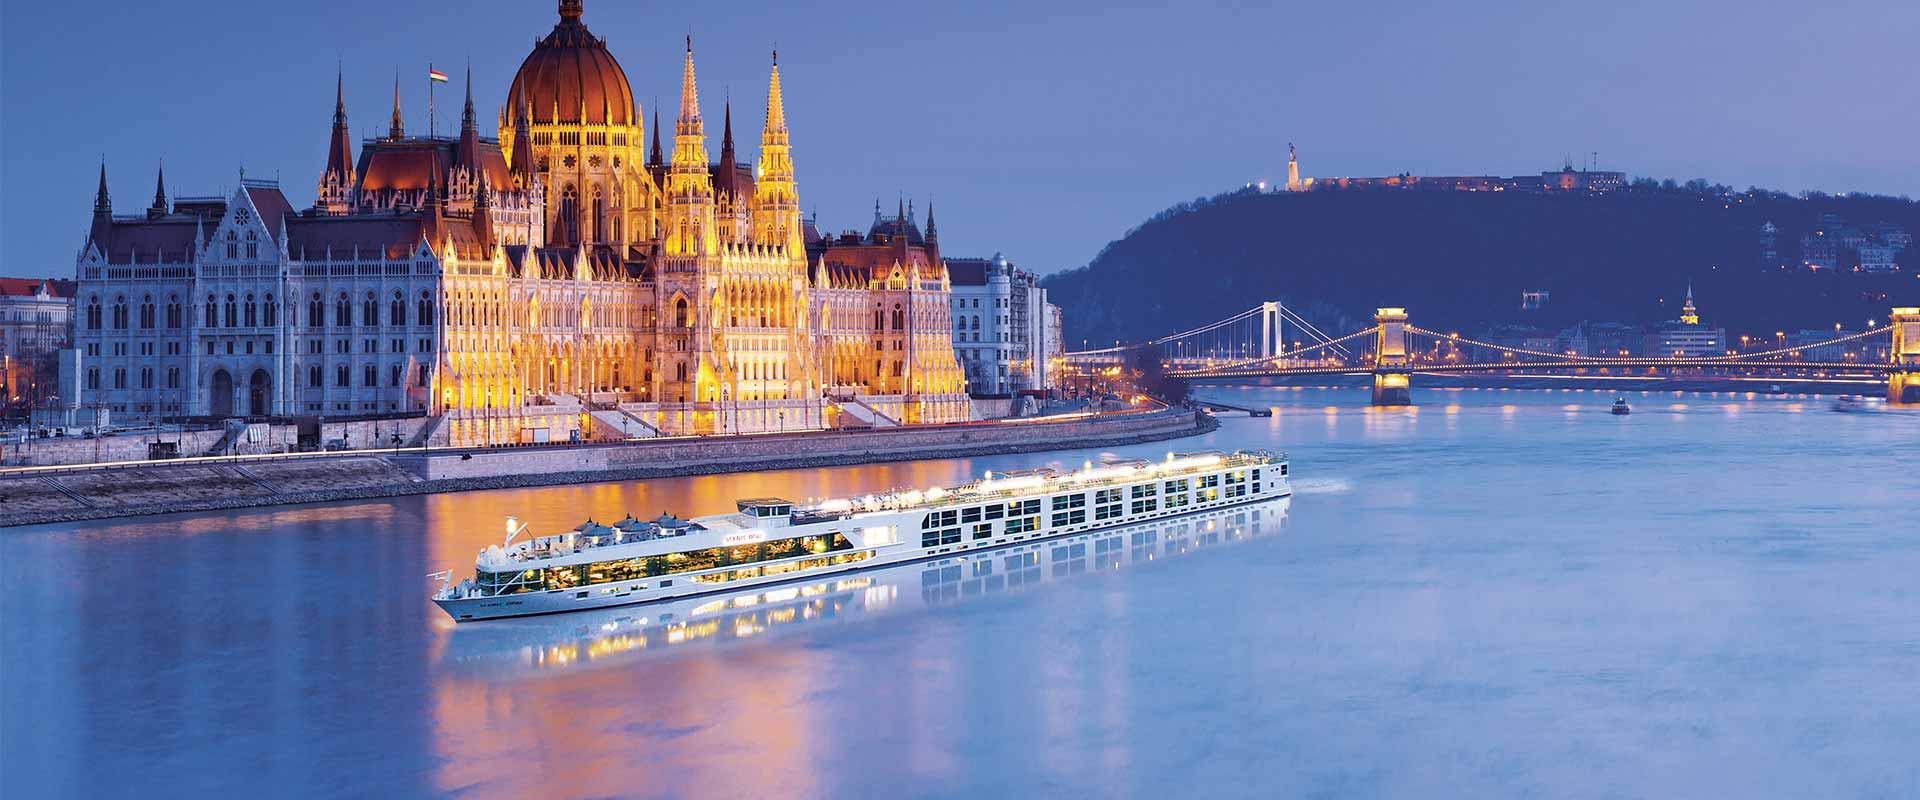 Jewels Of Europe 2019 Including Rudesheim Am Rhein By